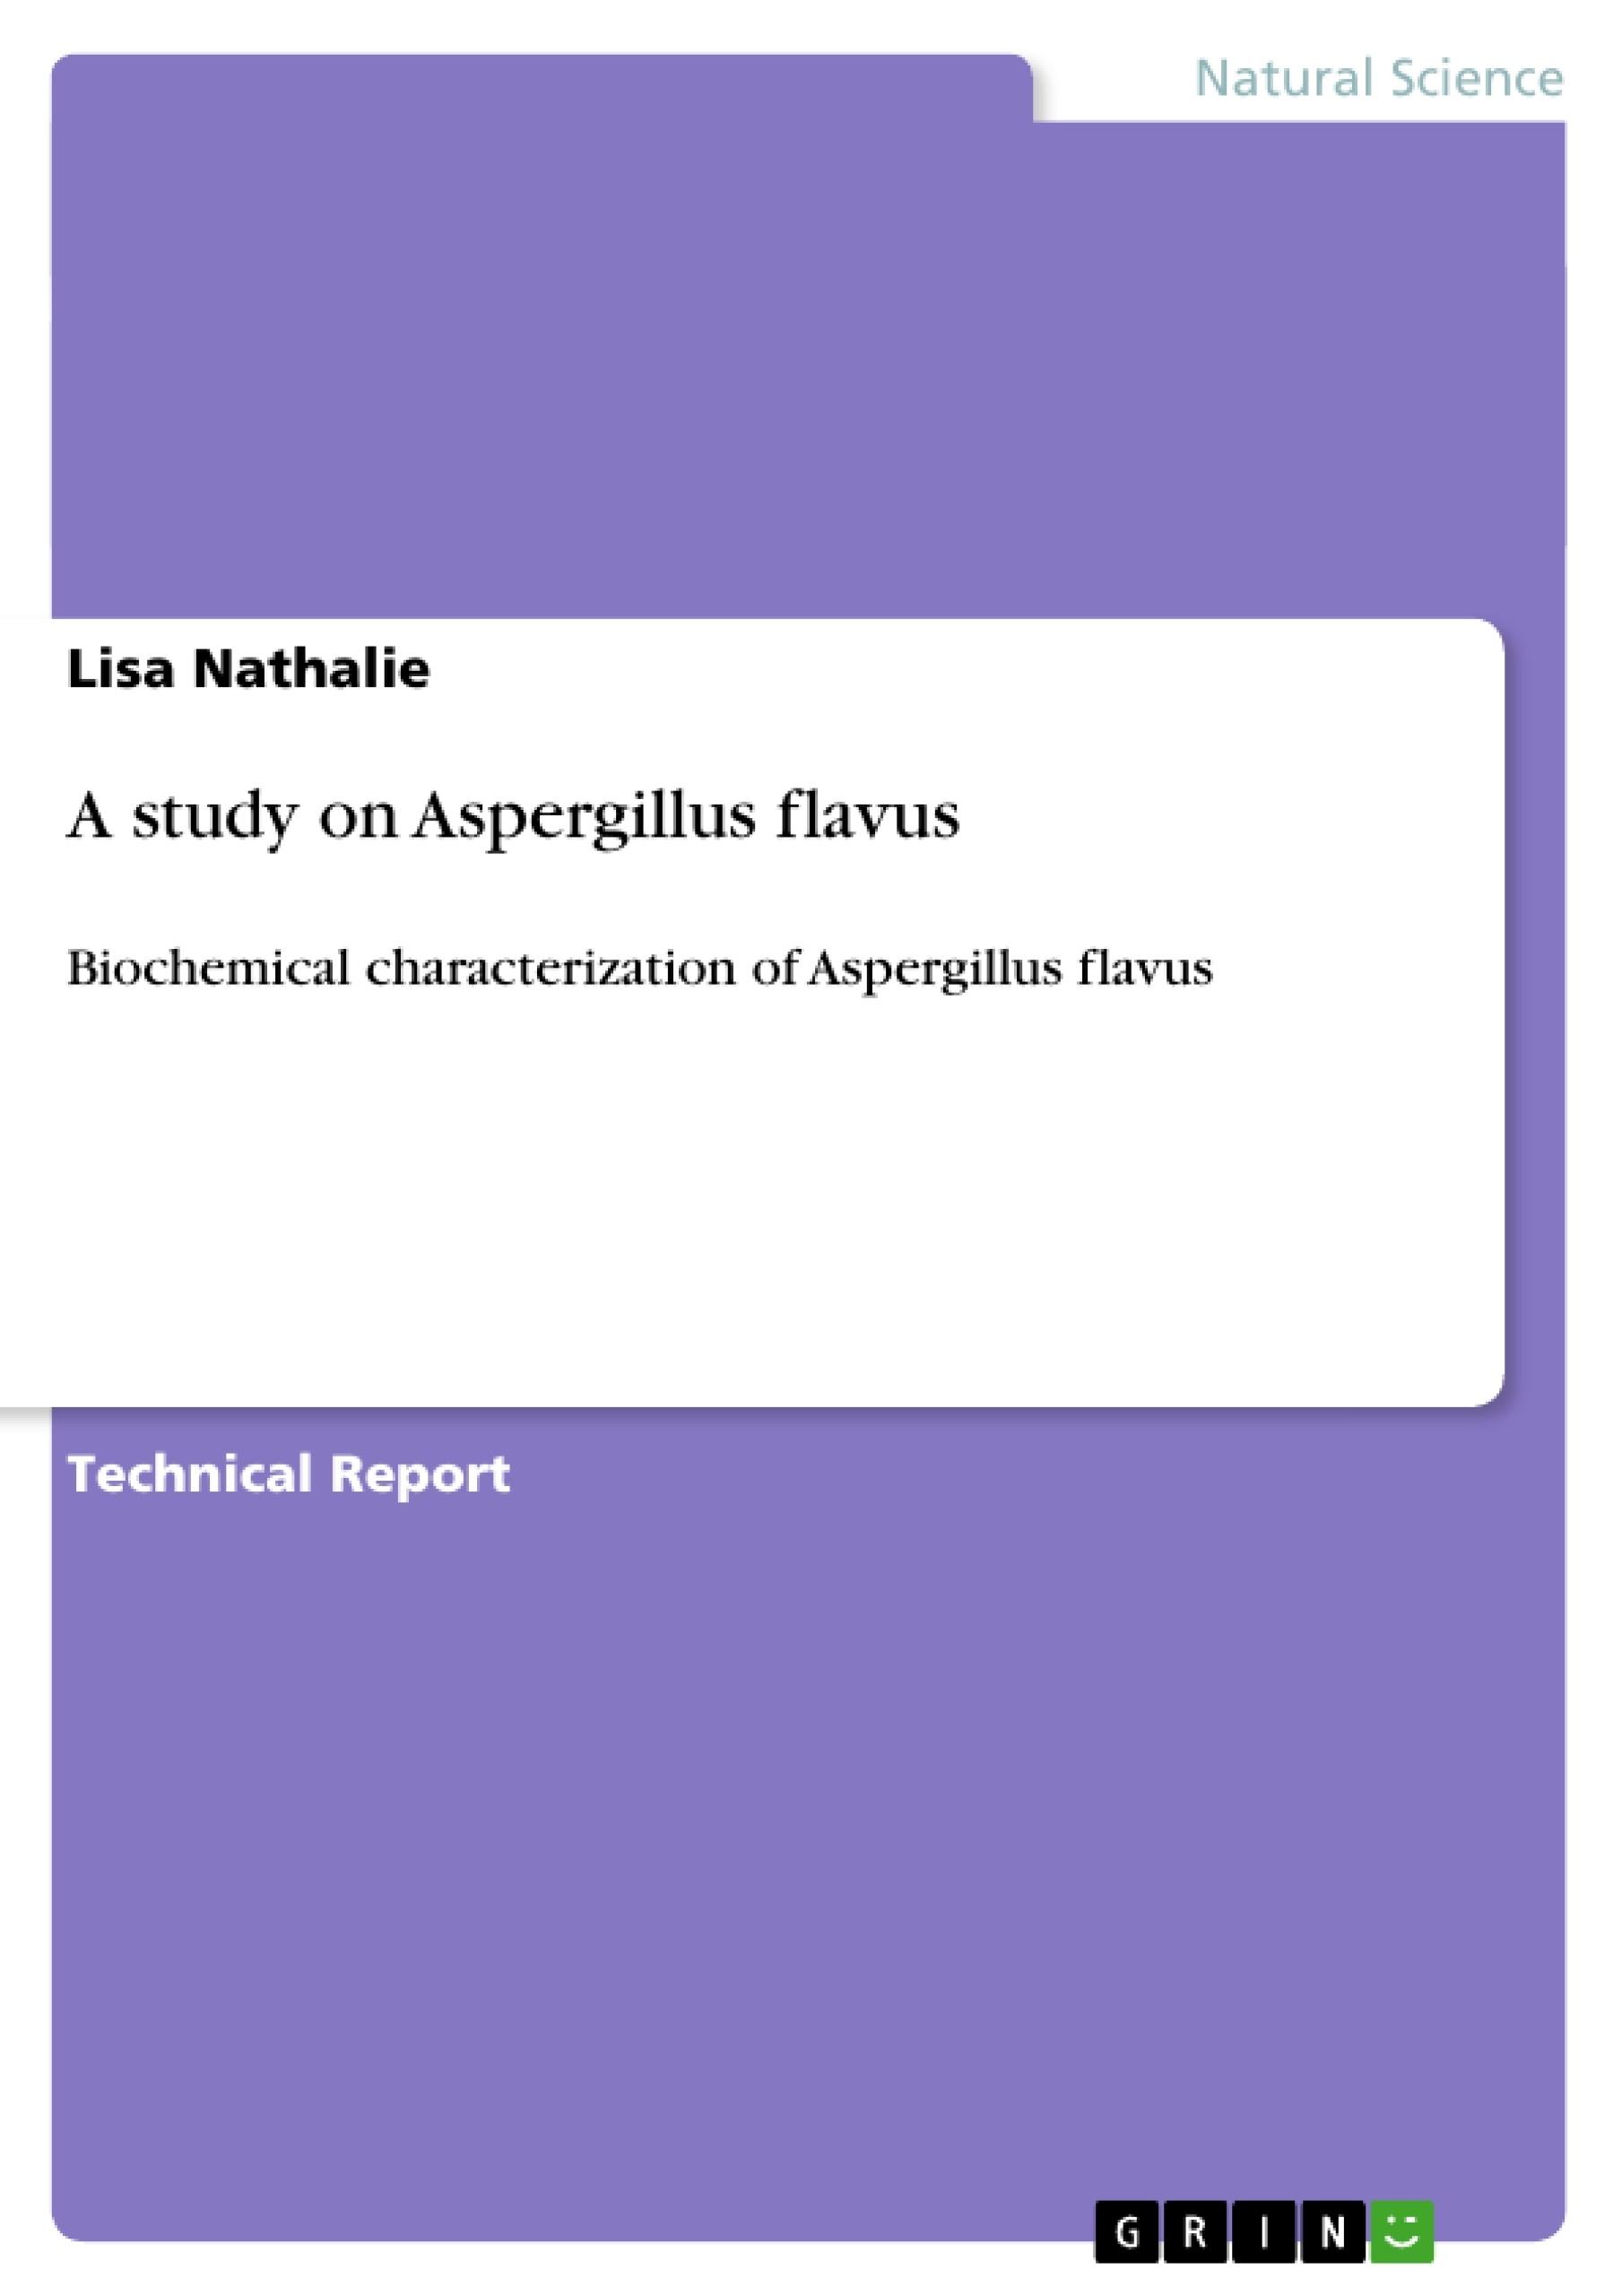 Title: A study on Aspergillus flavus